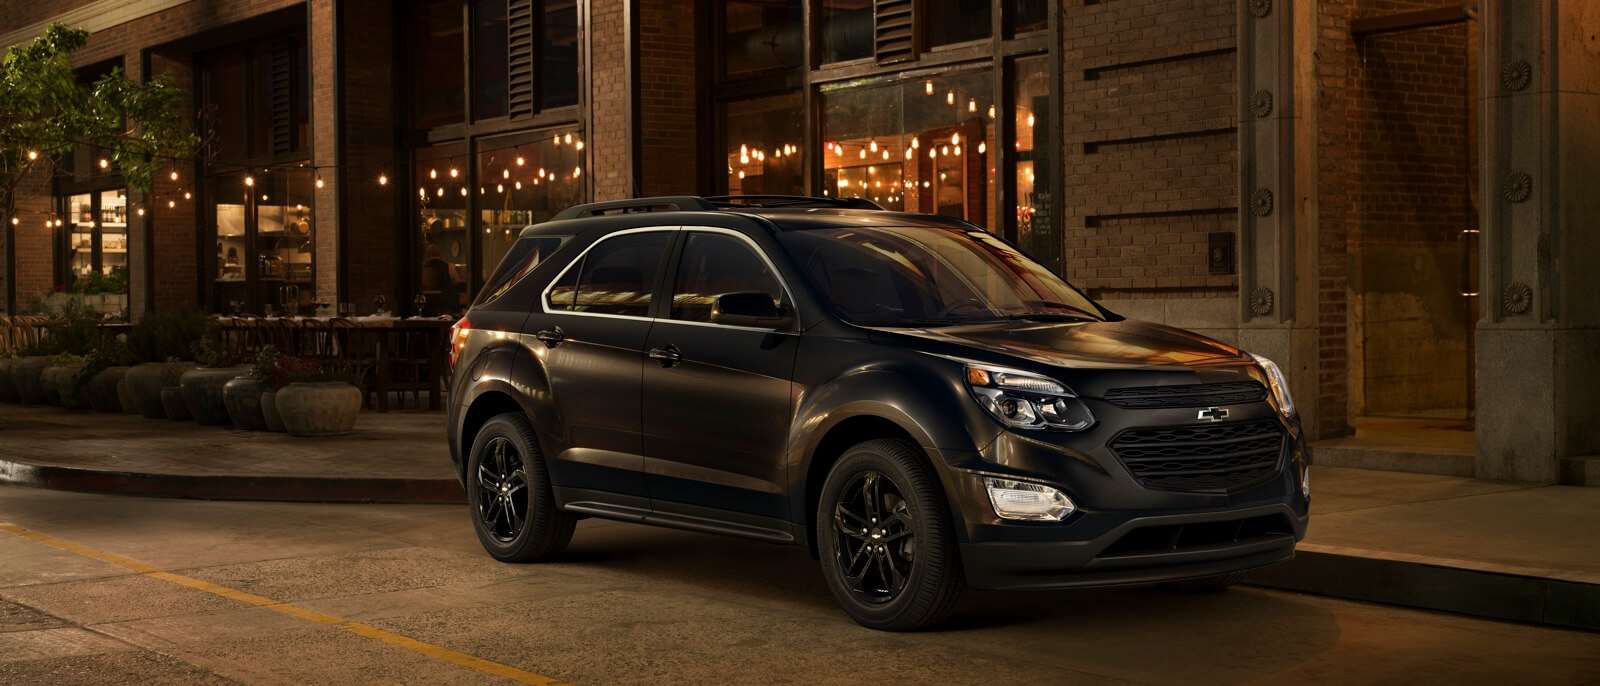 2017 Chevrolet Equinox dark exterior